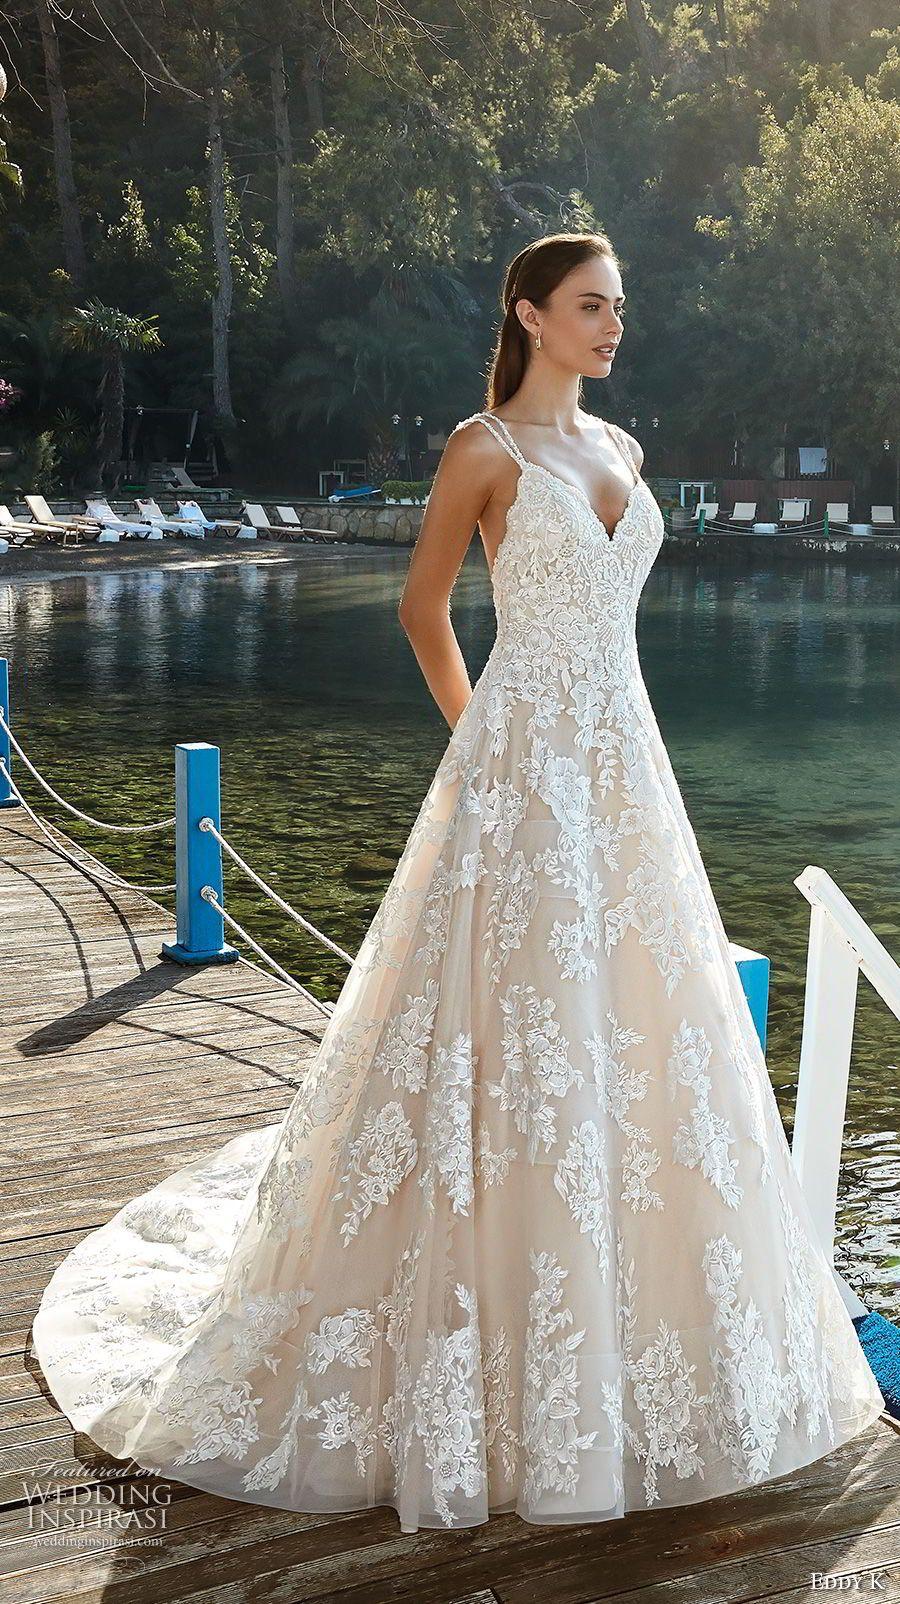 4676f47f9dec eddy k 2018 bridal double strap sweetheart neckline full embellishment  romantic a line wedding dress open back chapel train (16) mv -- Eddy K. Dreams  2019 ...